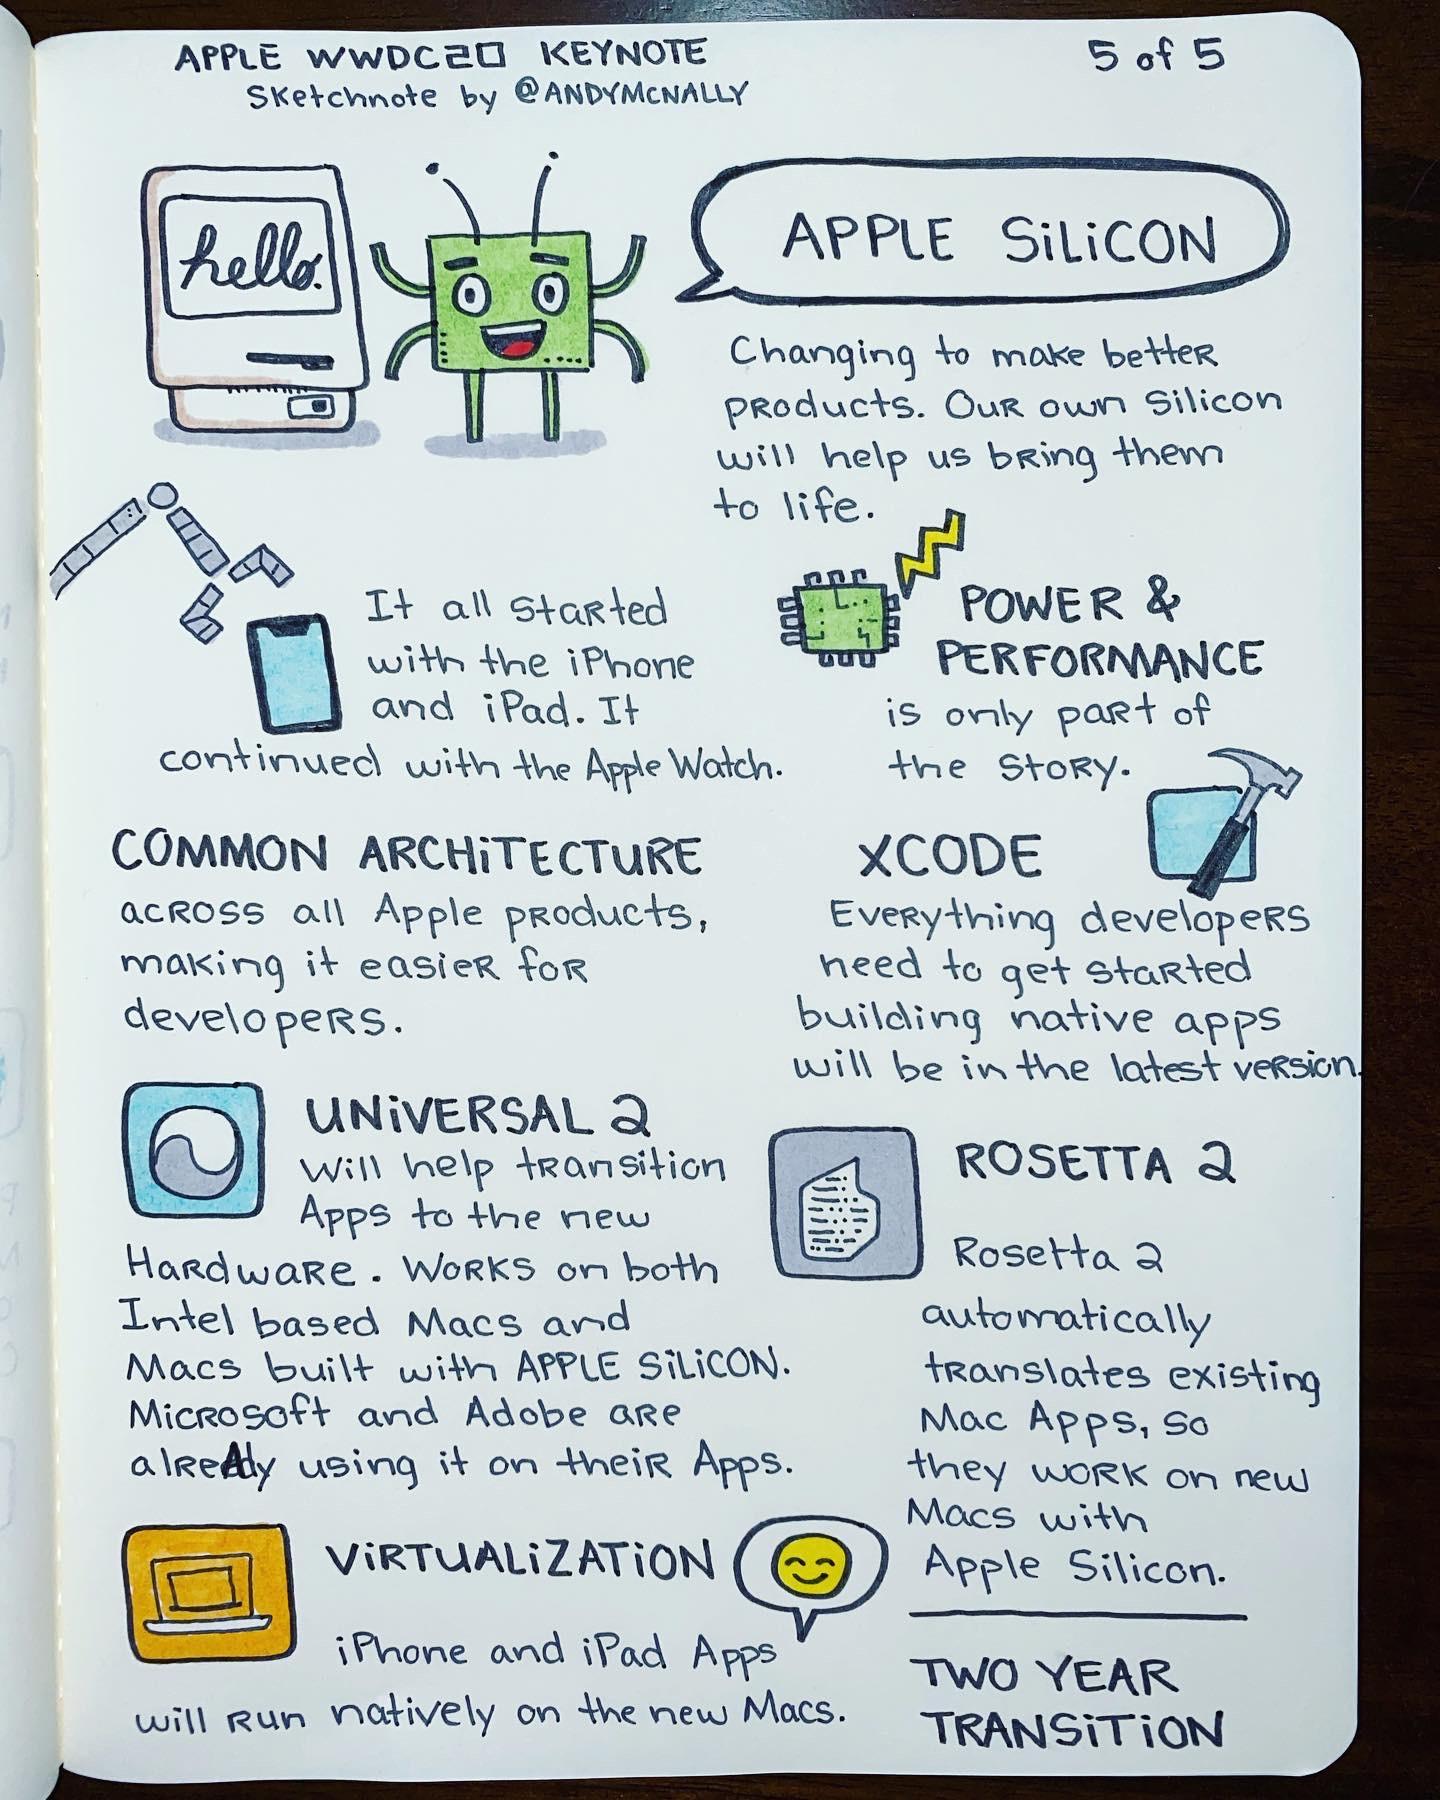 Apple WWDC 2020 Keynote drawing 5 of 5